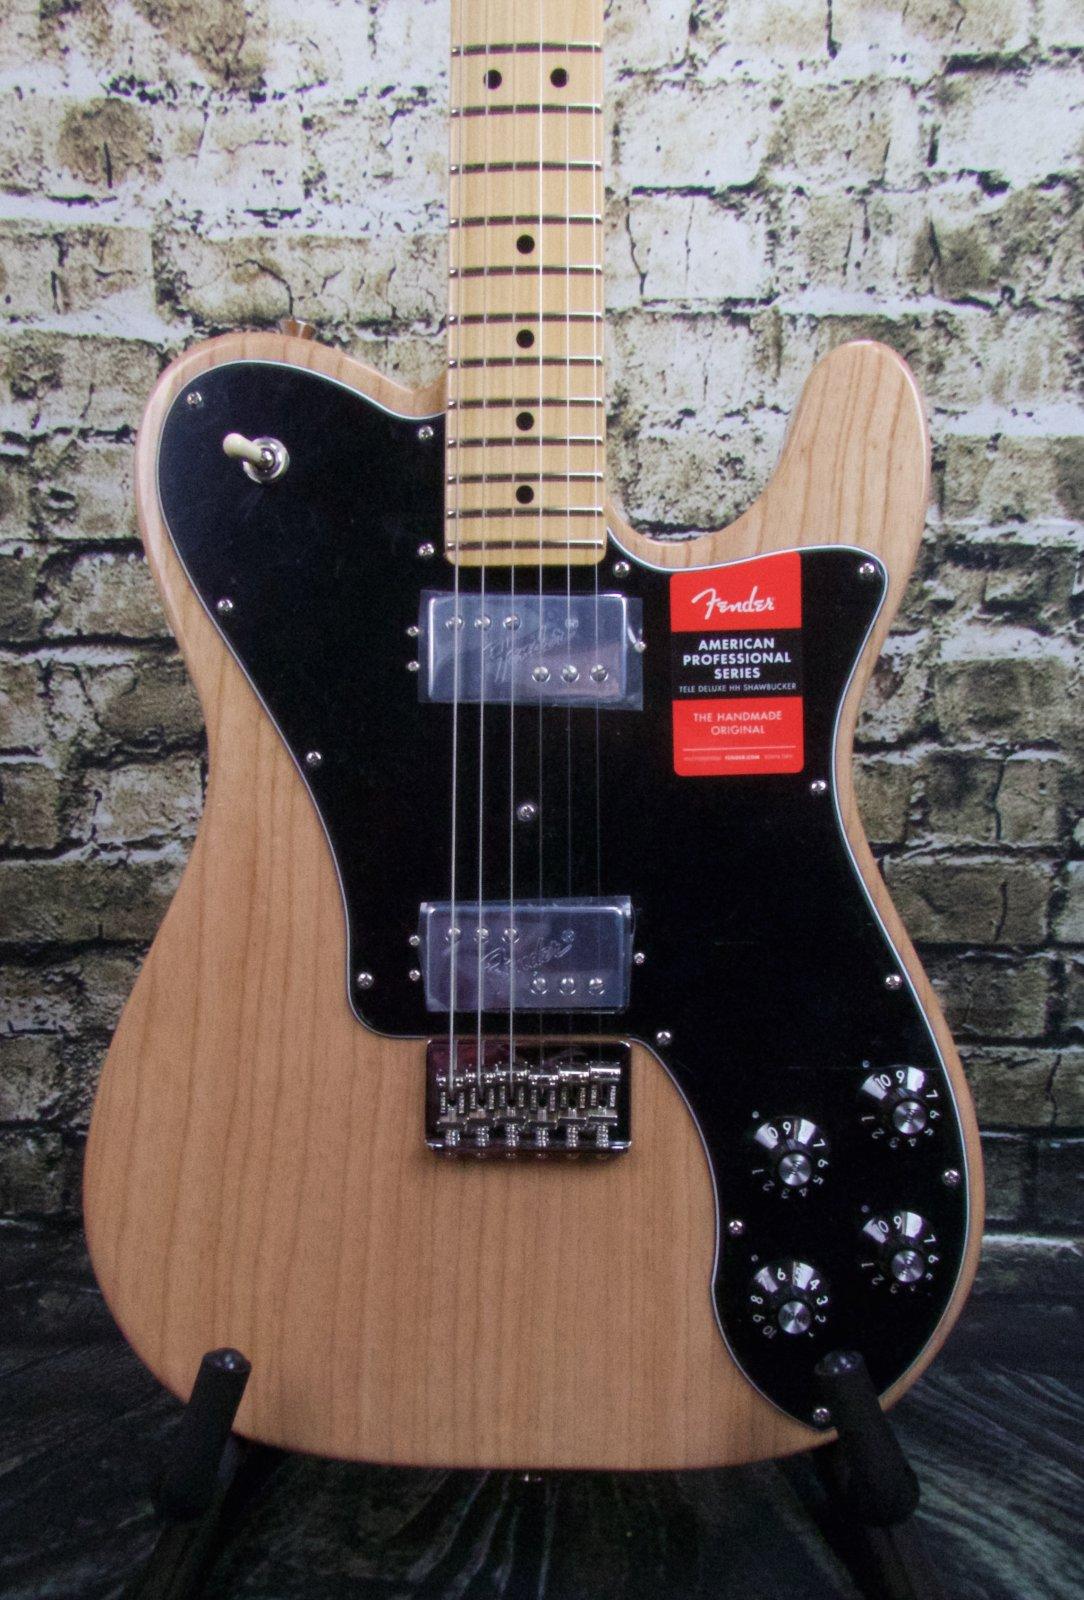 Fender American Professional Telecaster Deluxe ShawBucker Maple Fingerboard - Natural